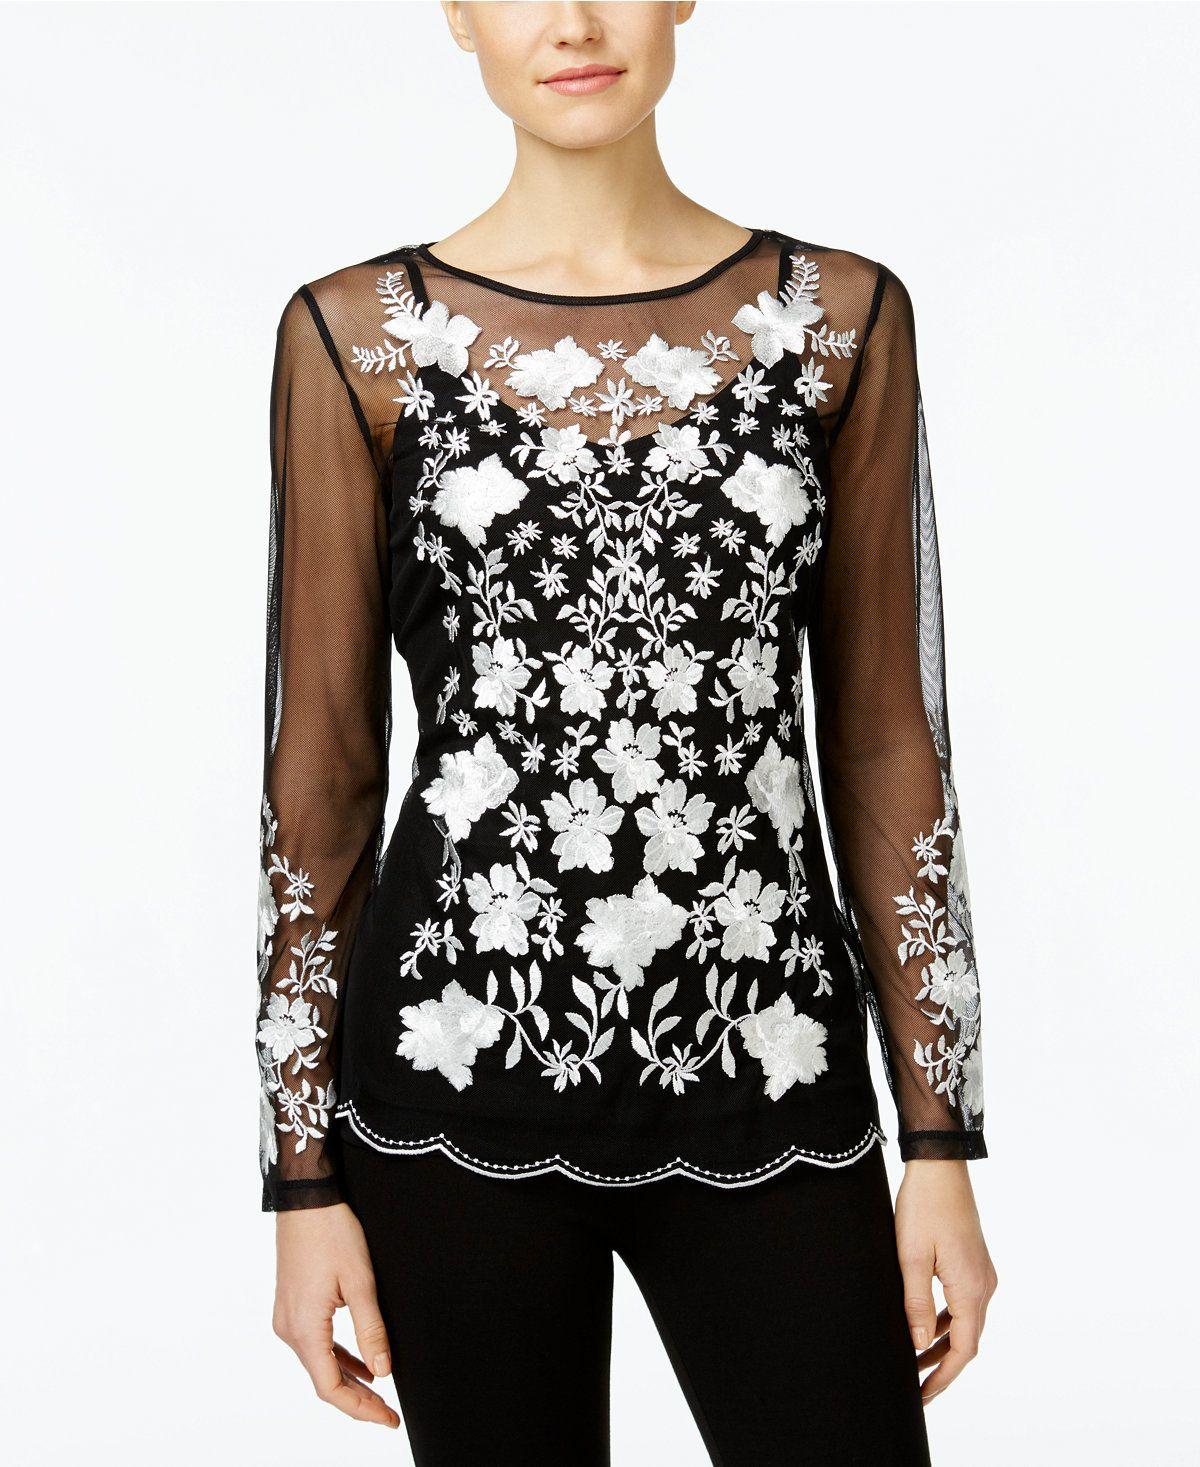 9e476e78381 INC International Concepts Petite Floral-Embroidered Illusion Top ...